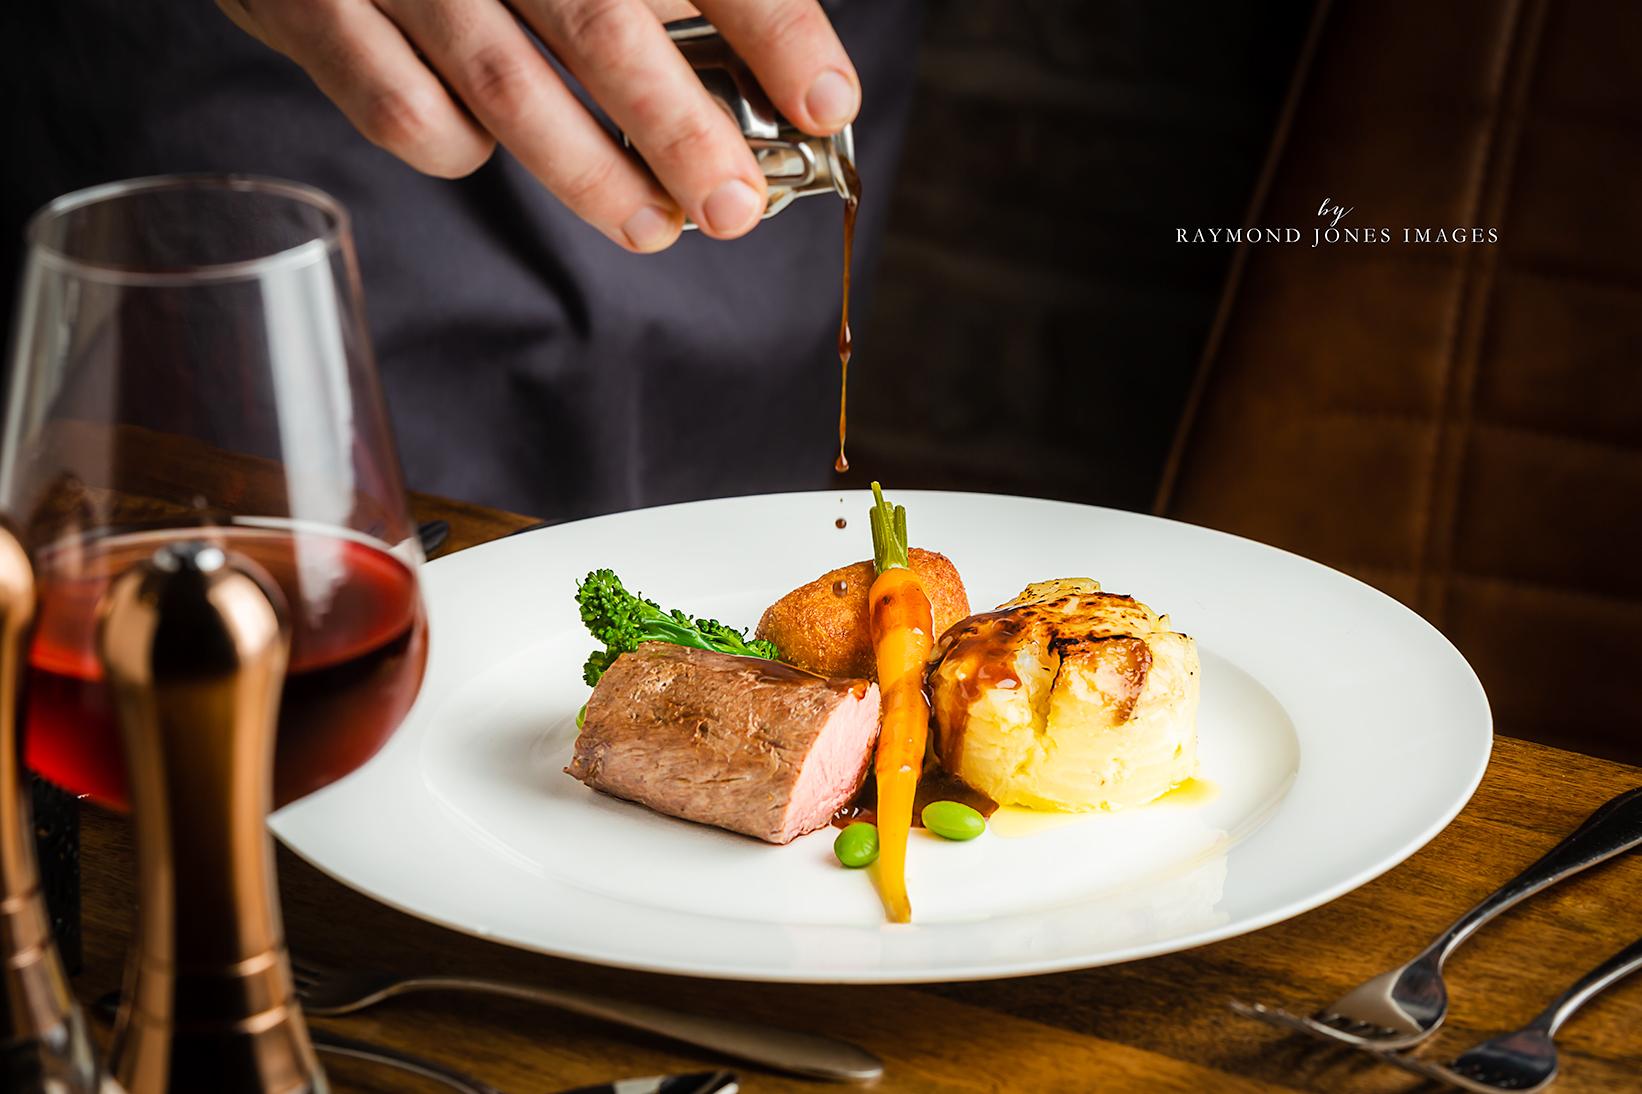 raymond_jones_commercial_photographer_food